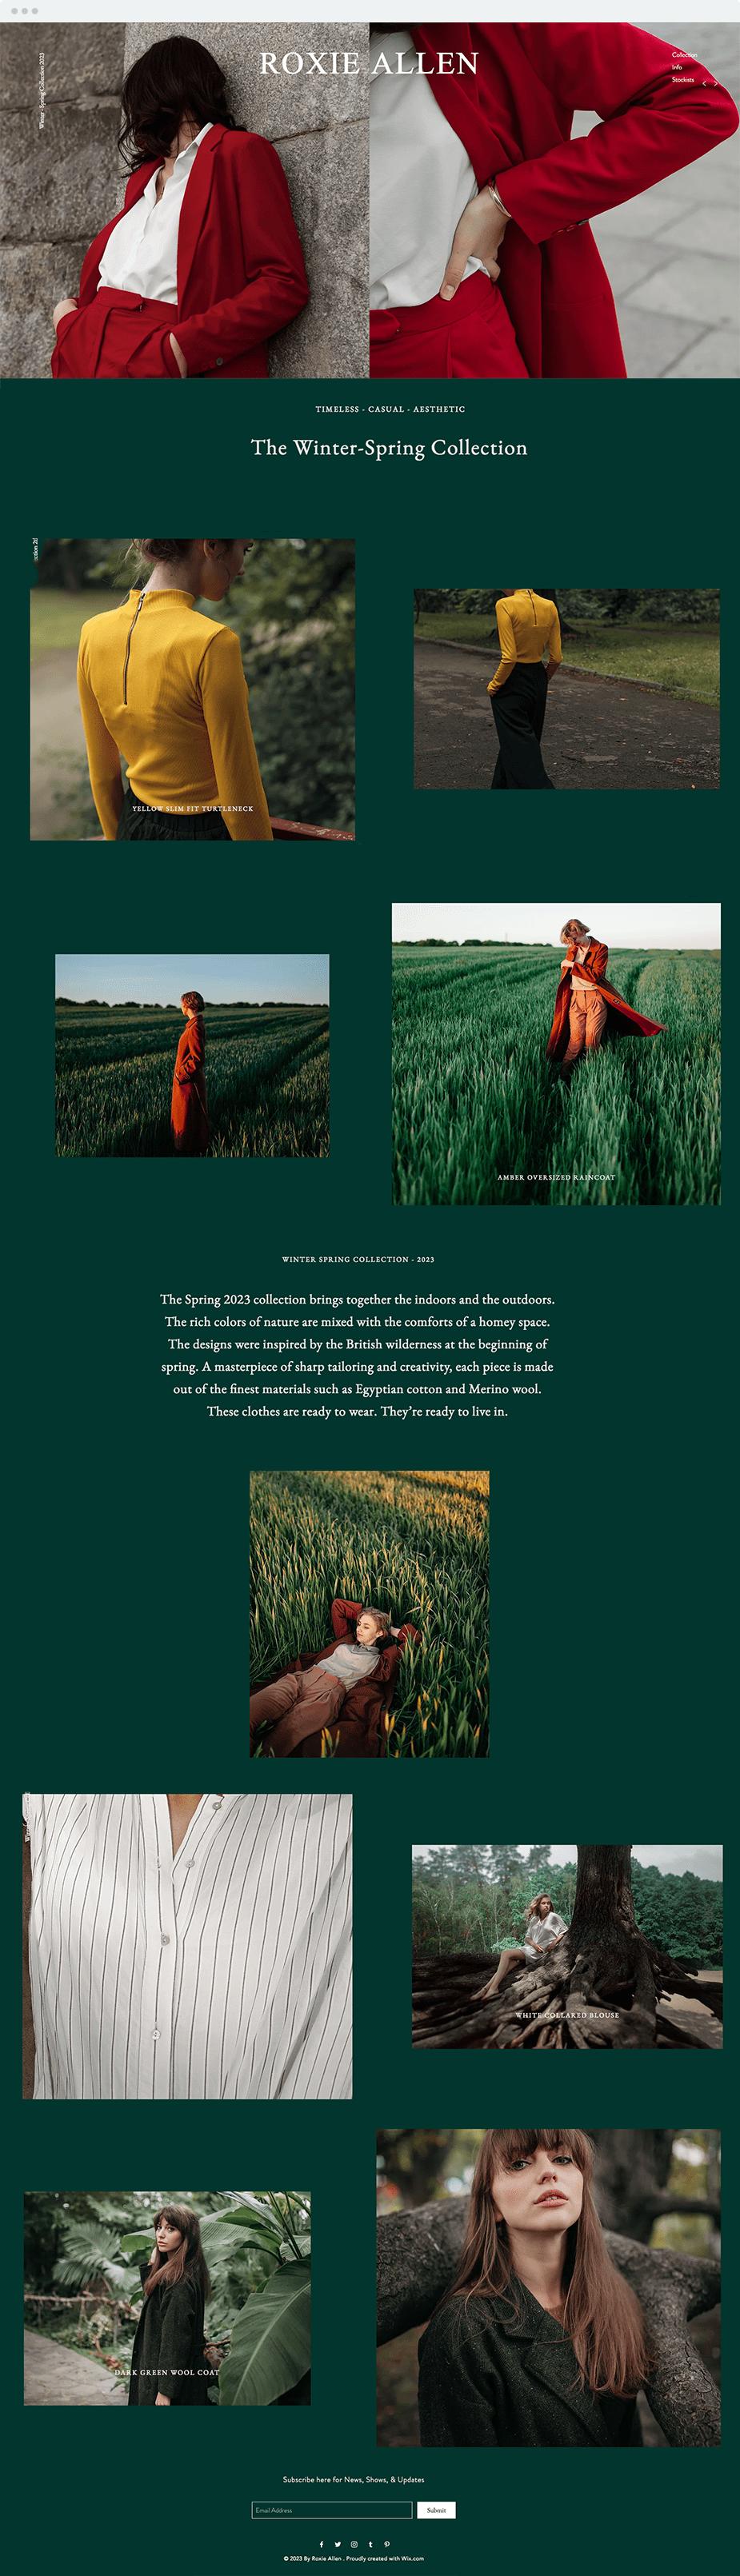 Template para Designer de Moda